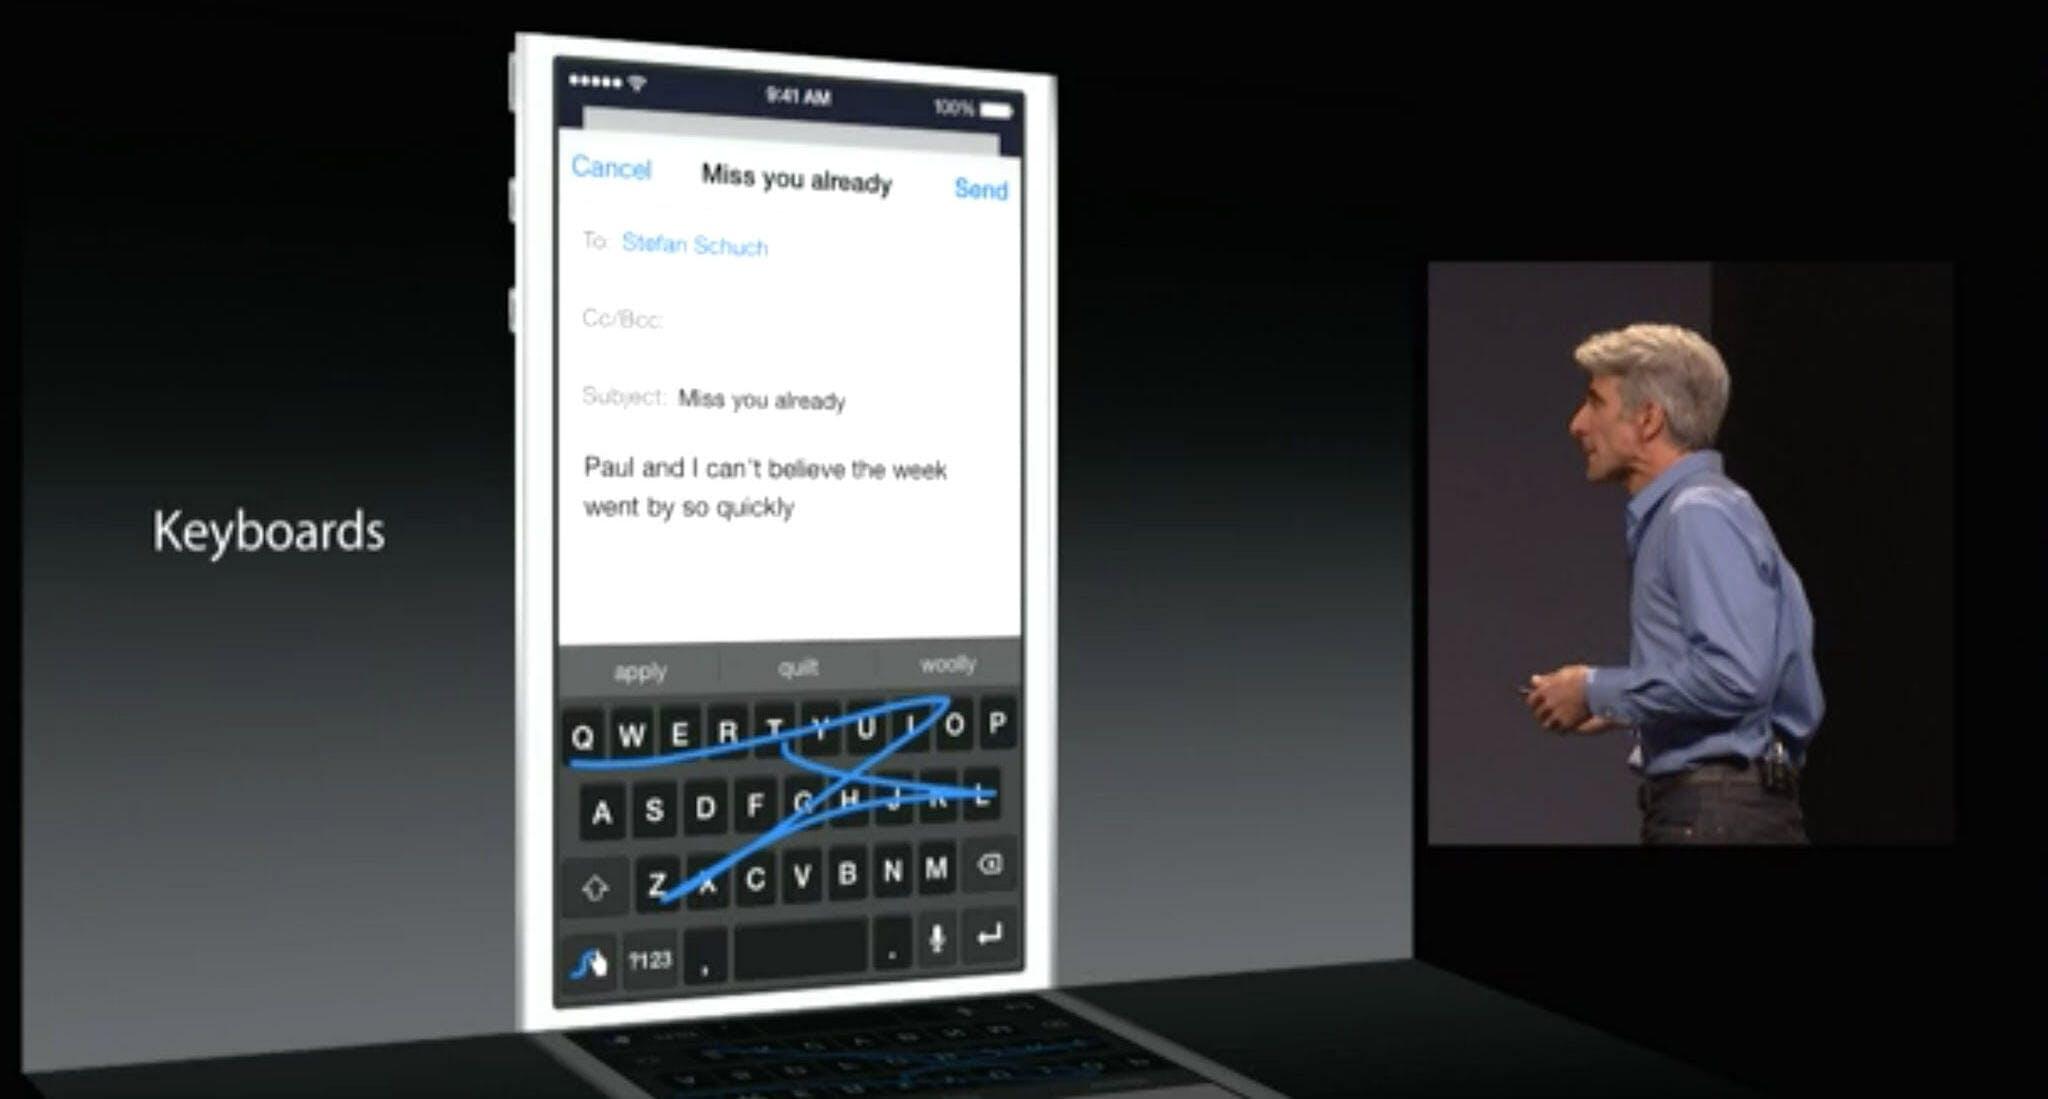 Swiftkey Apple Keynote